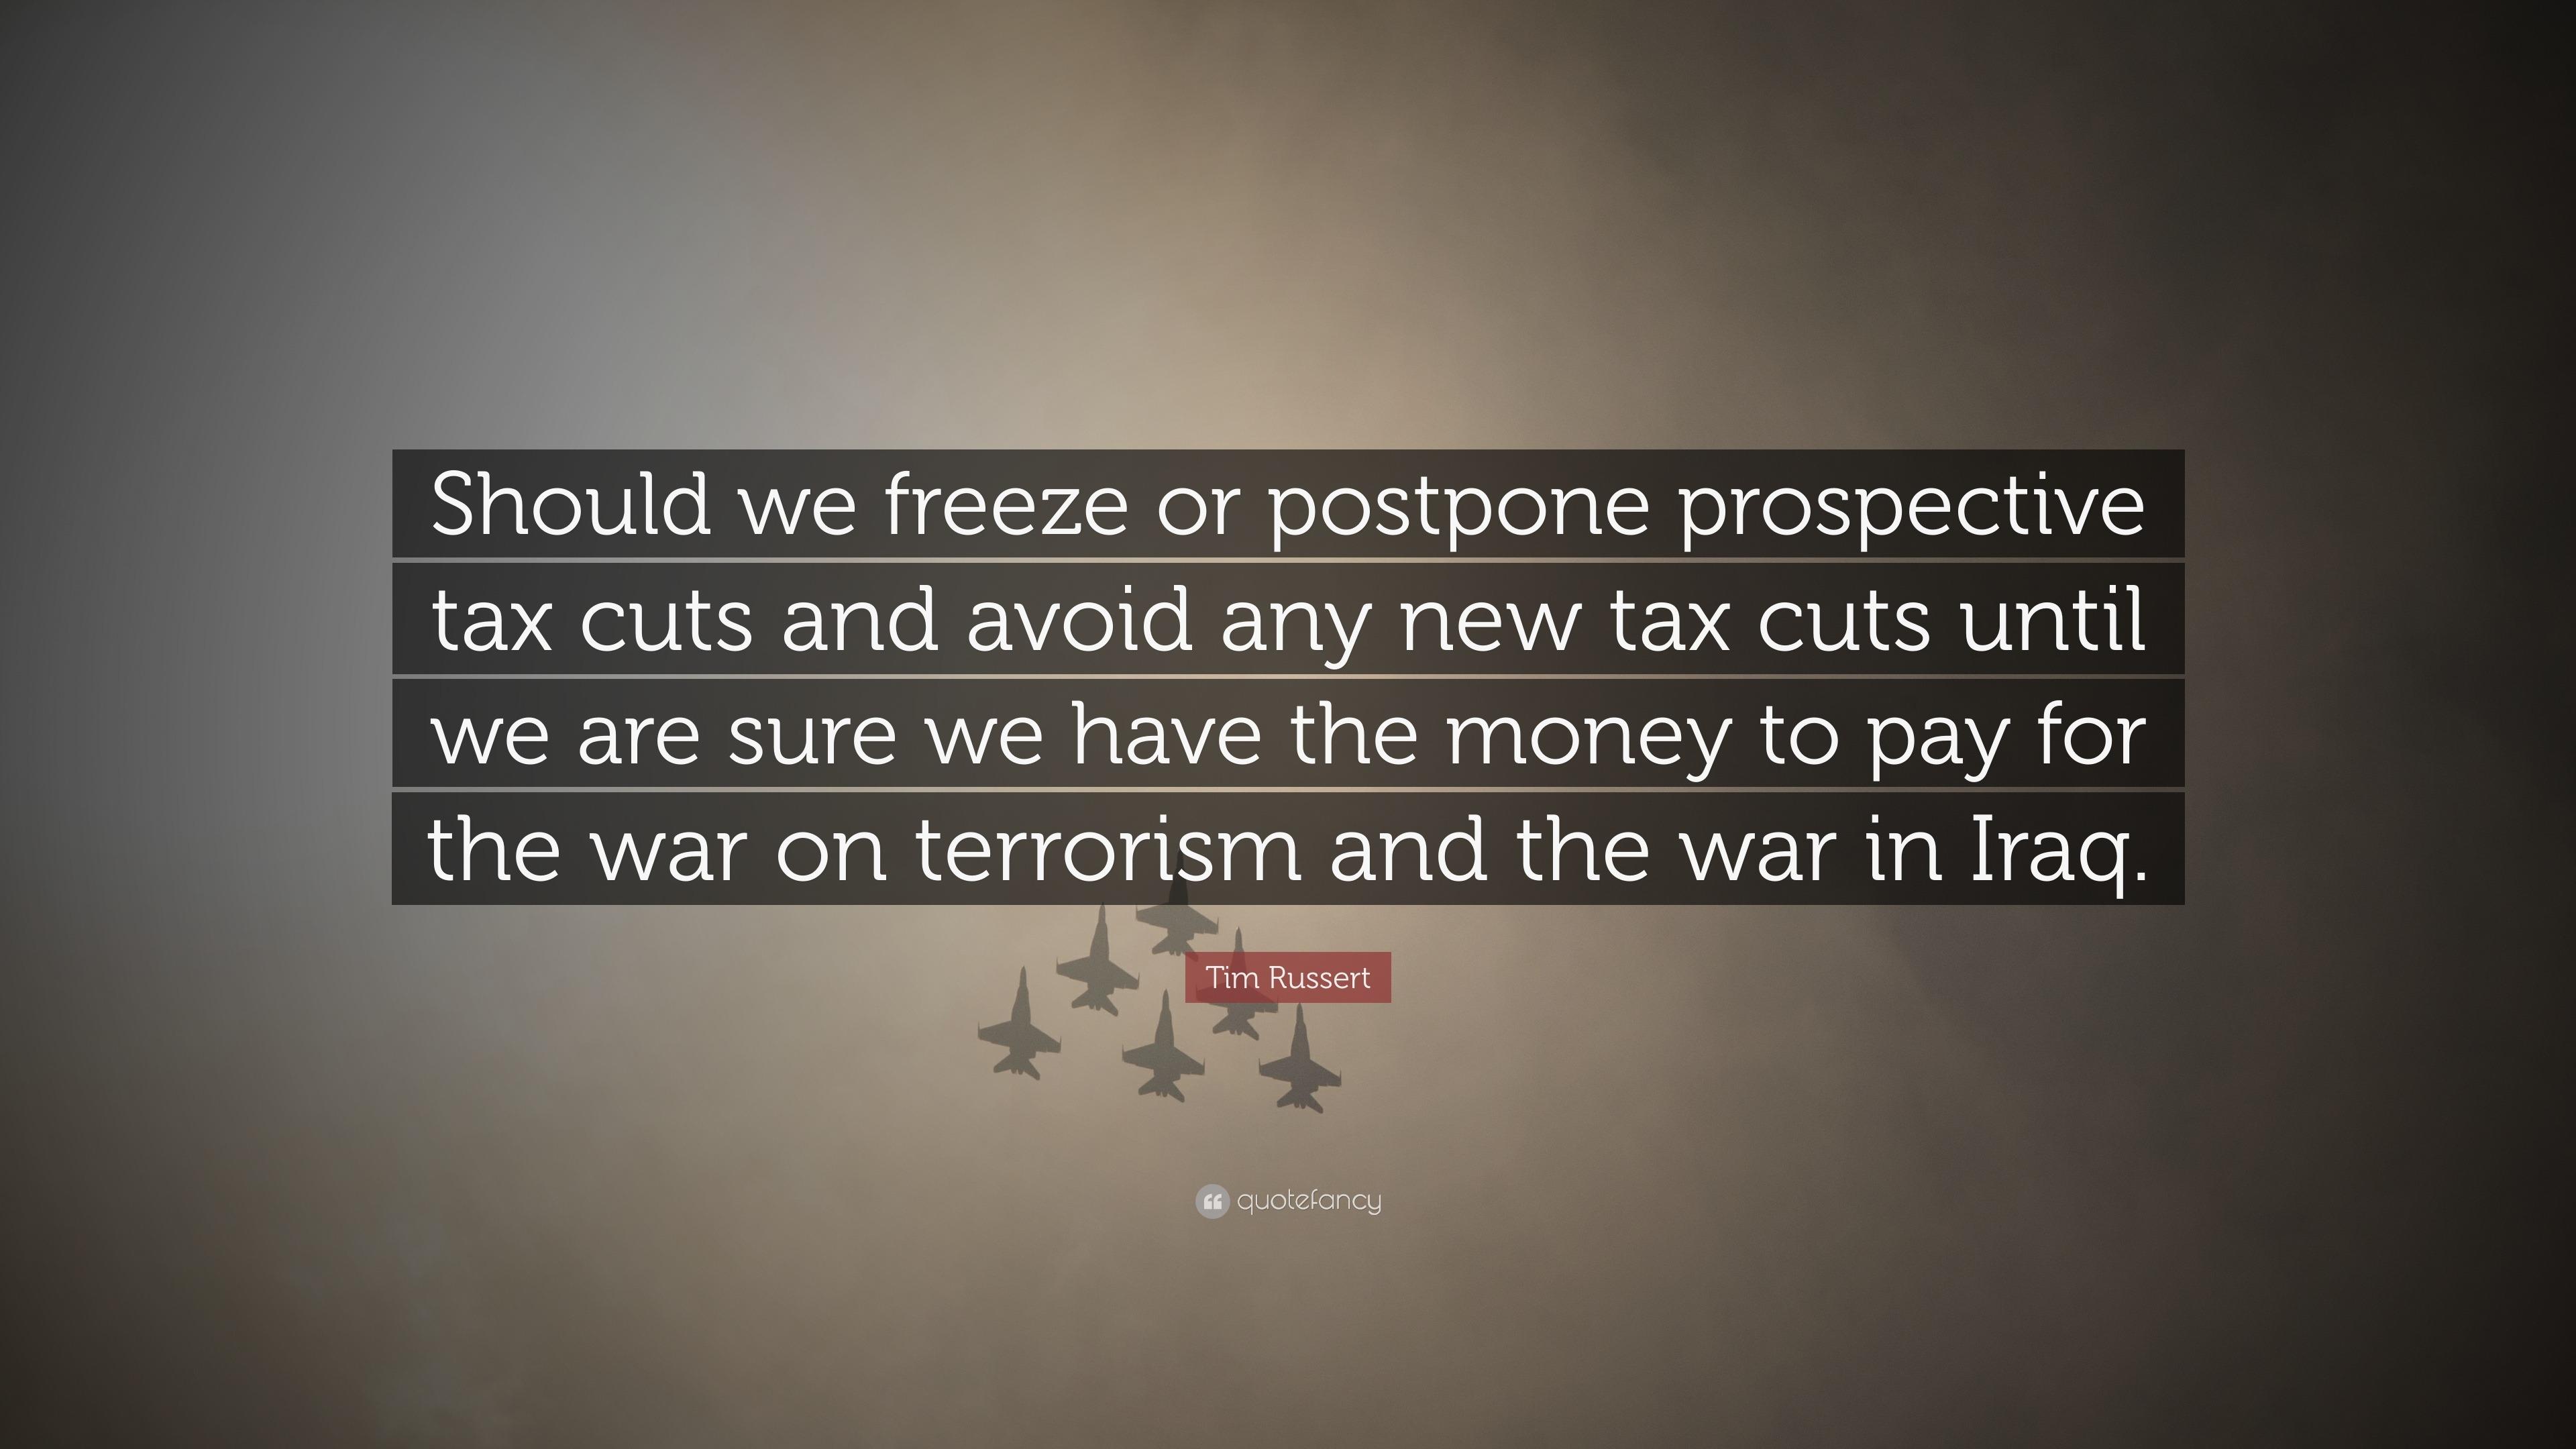 tim russert quote should we freeze or postpone prospective tax